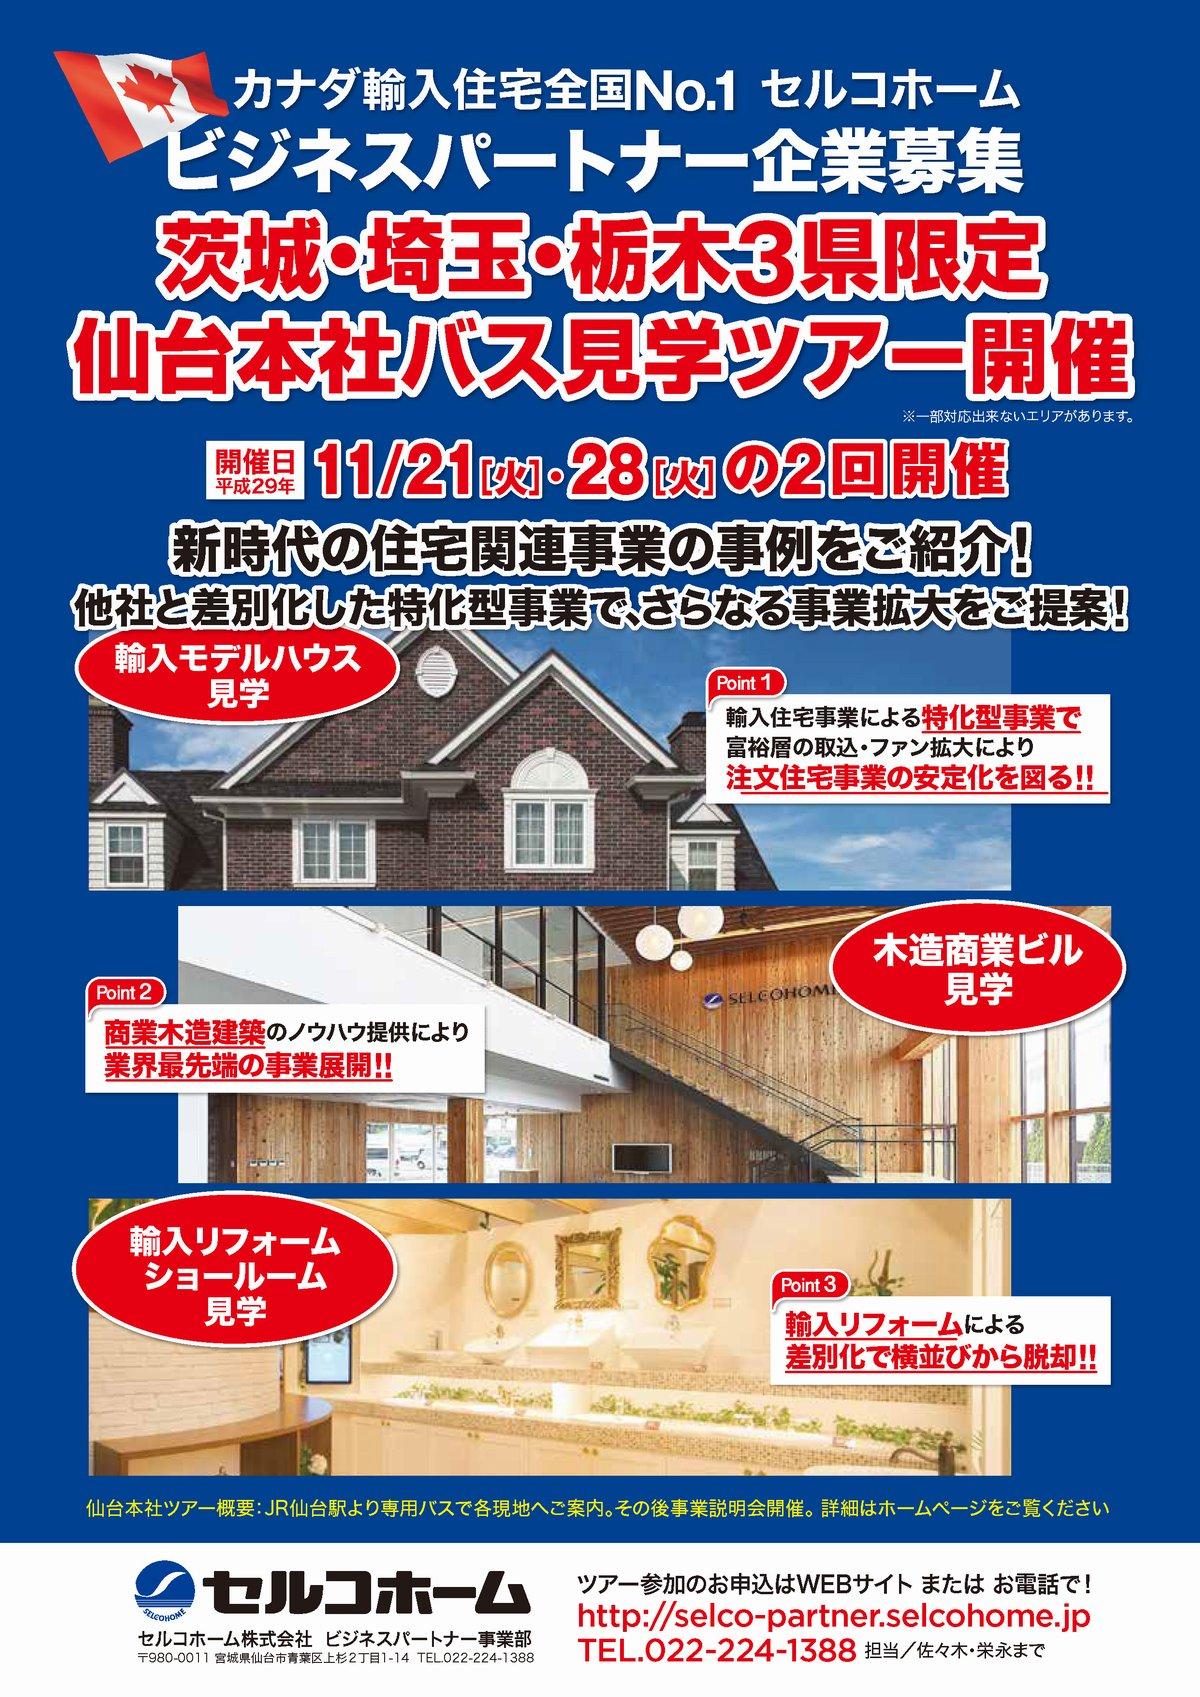 selcohome_20171121-1128_SendaiTour